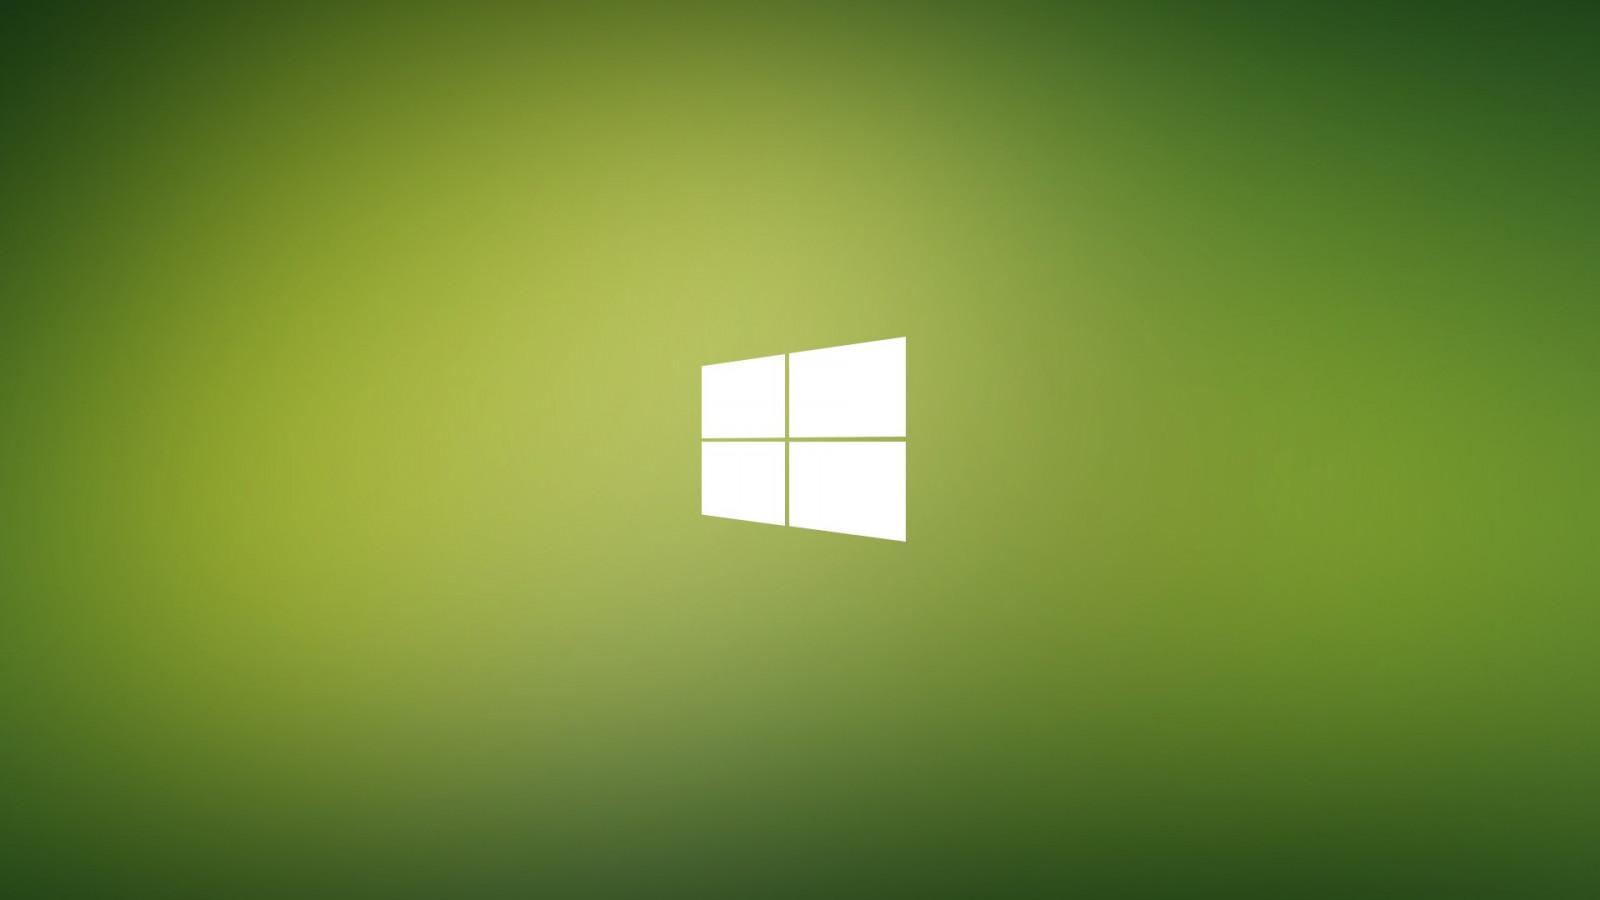 X Px Green Microsoft Windows Window Windows Anniversary Windows